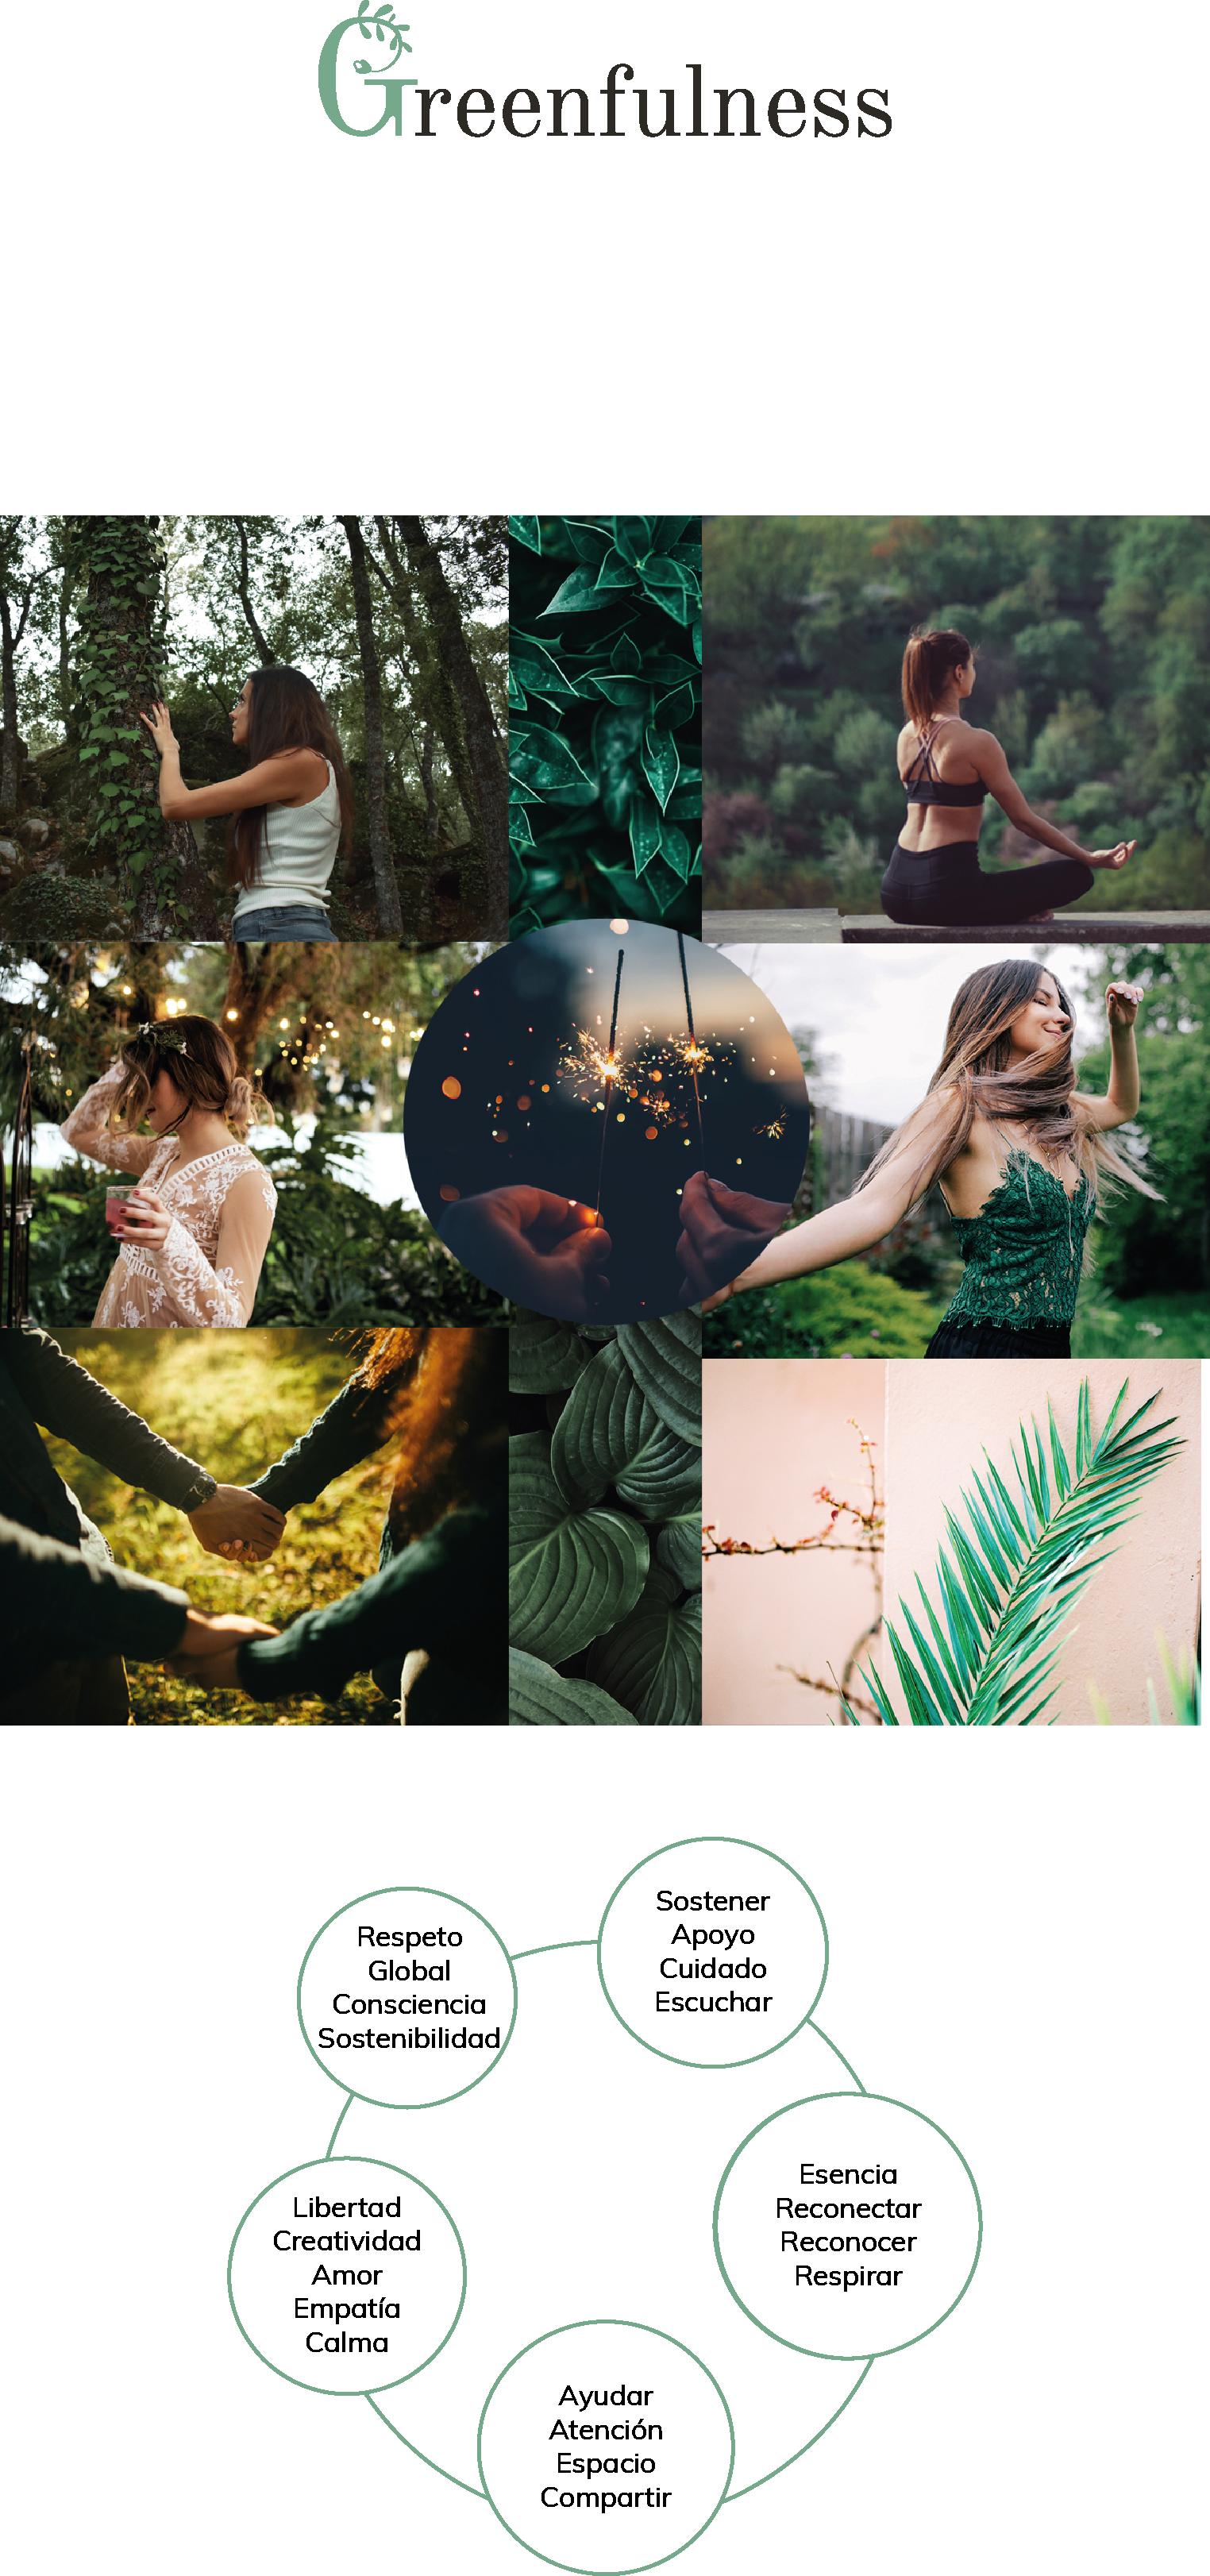 Inspiración Greenfulness